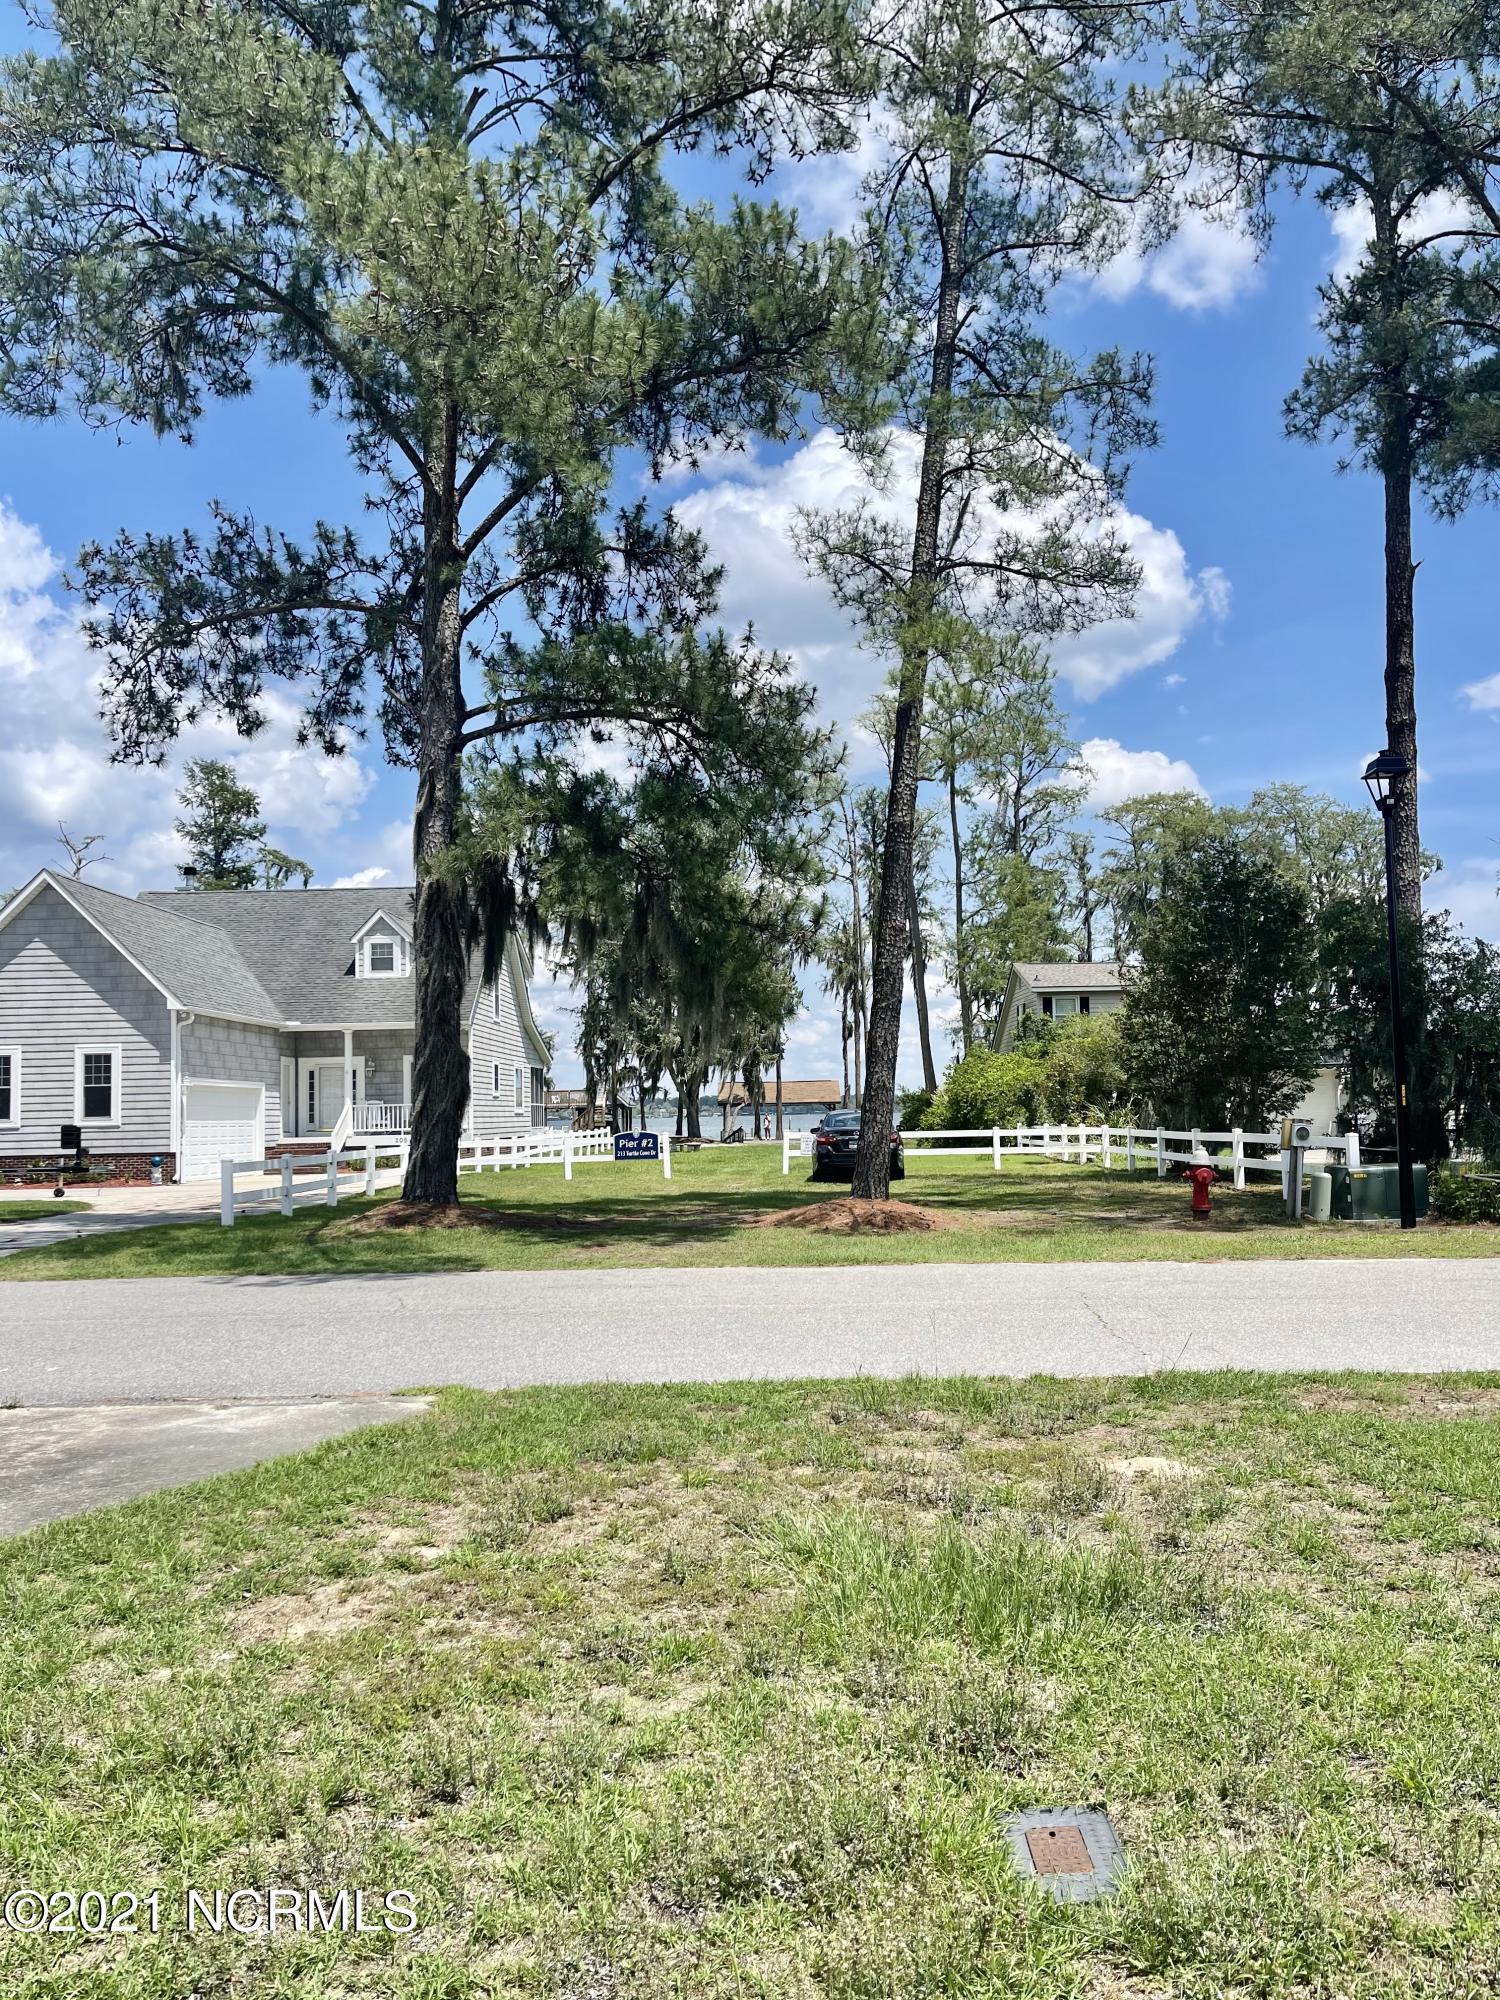 214 Turtle Cove Drive, Elizabethtown, North Carolina 28337, 3 Bedrooms Bedrooms, 5 Rooms Rooms,2 BathroomsBathrooms,Single family residence,For sale,Turtle Cove,100276674